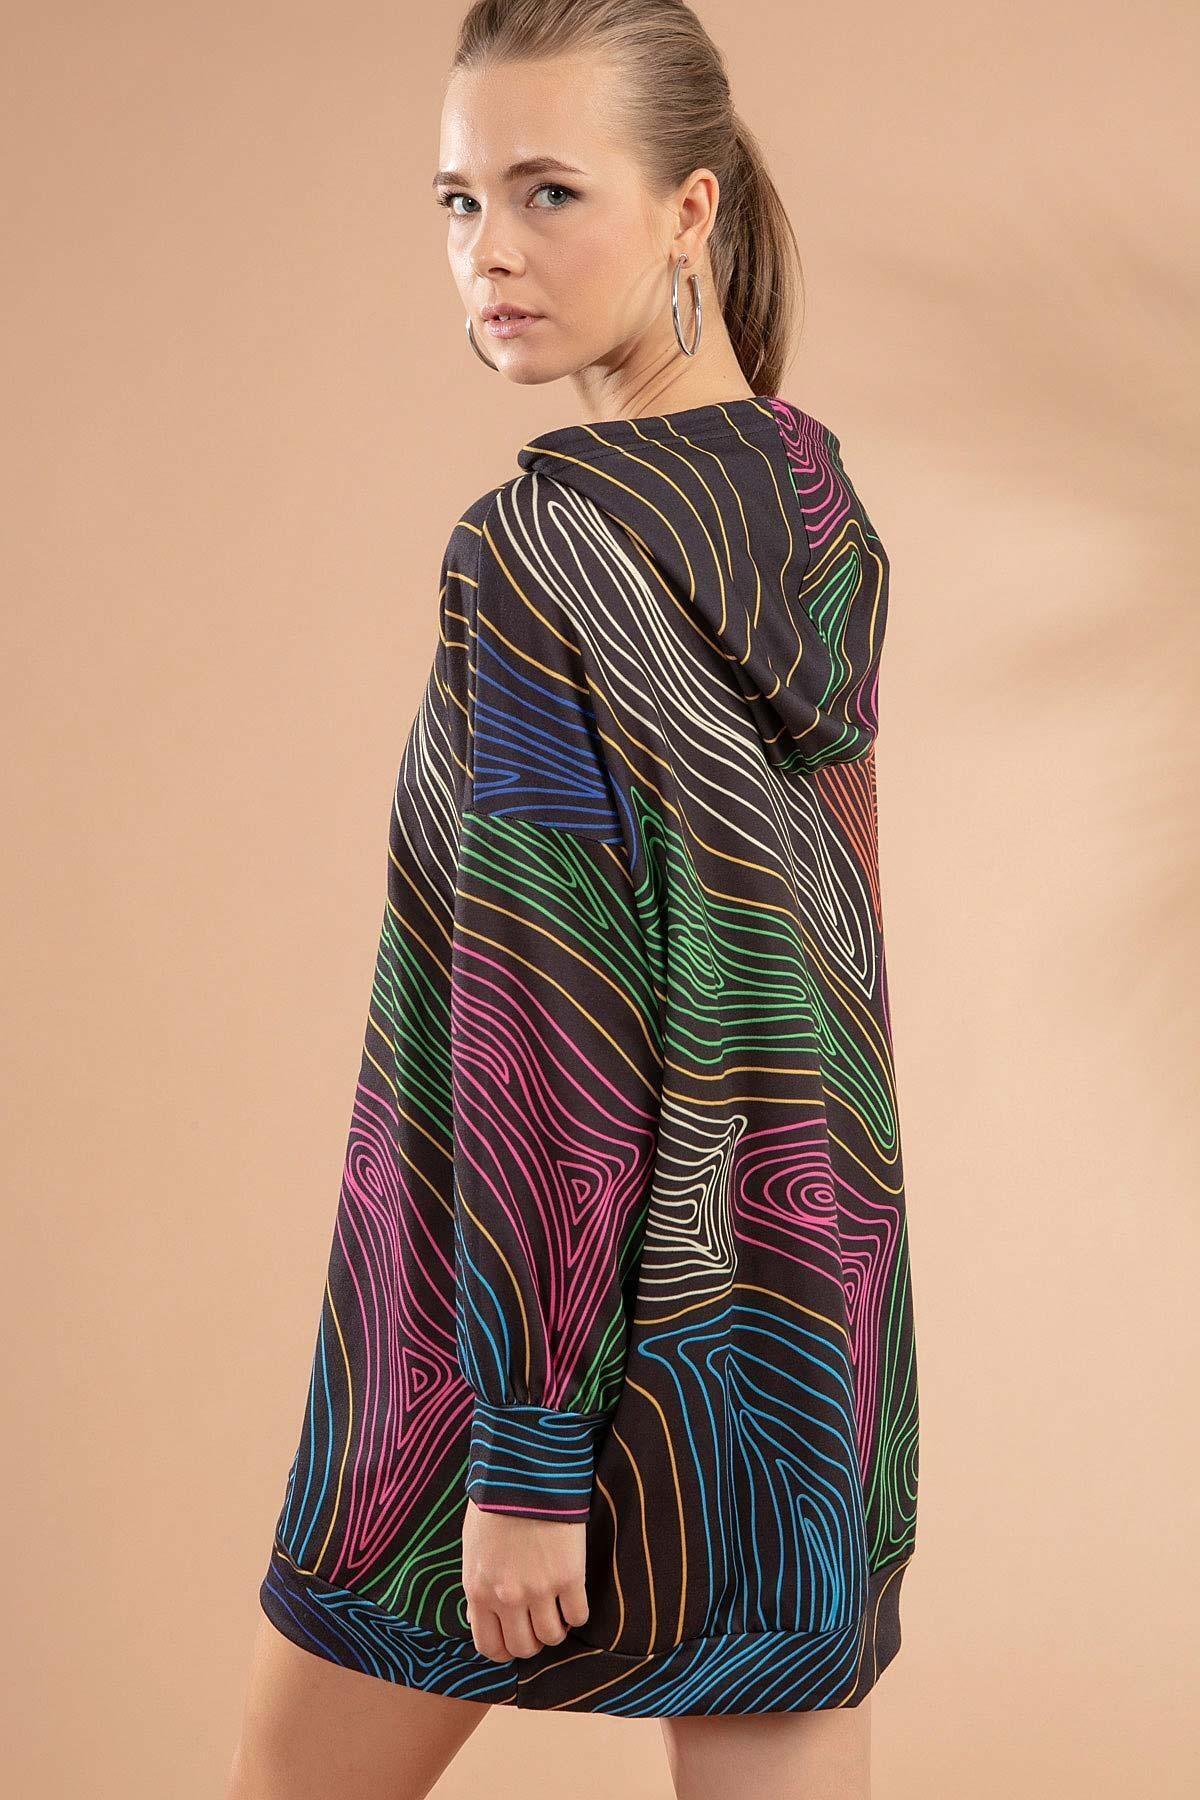 Pattaya Kadın Çizgili Kapşonlu Sweatshirt Elbise Y20w110-4125-18 3